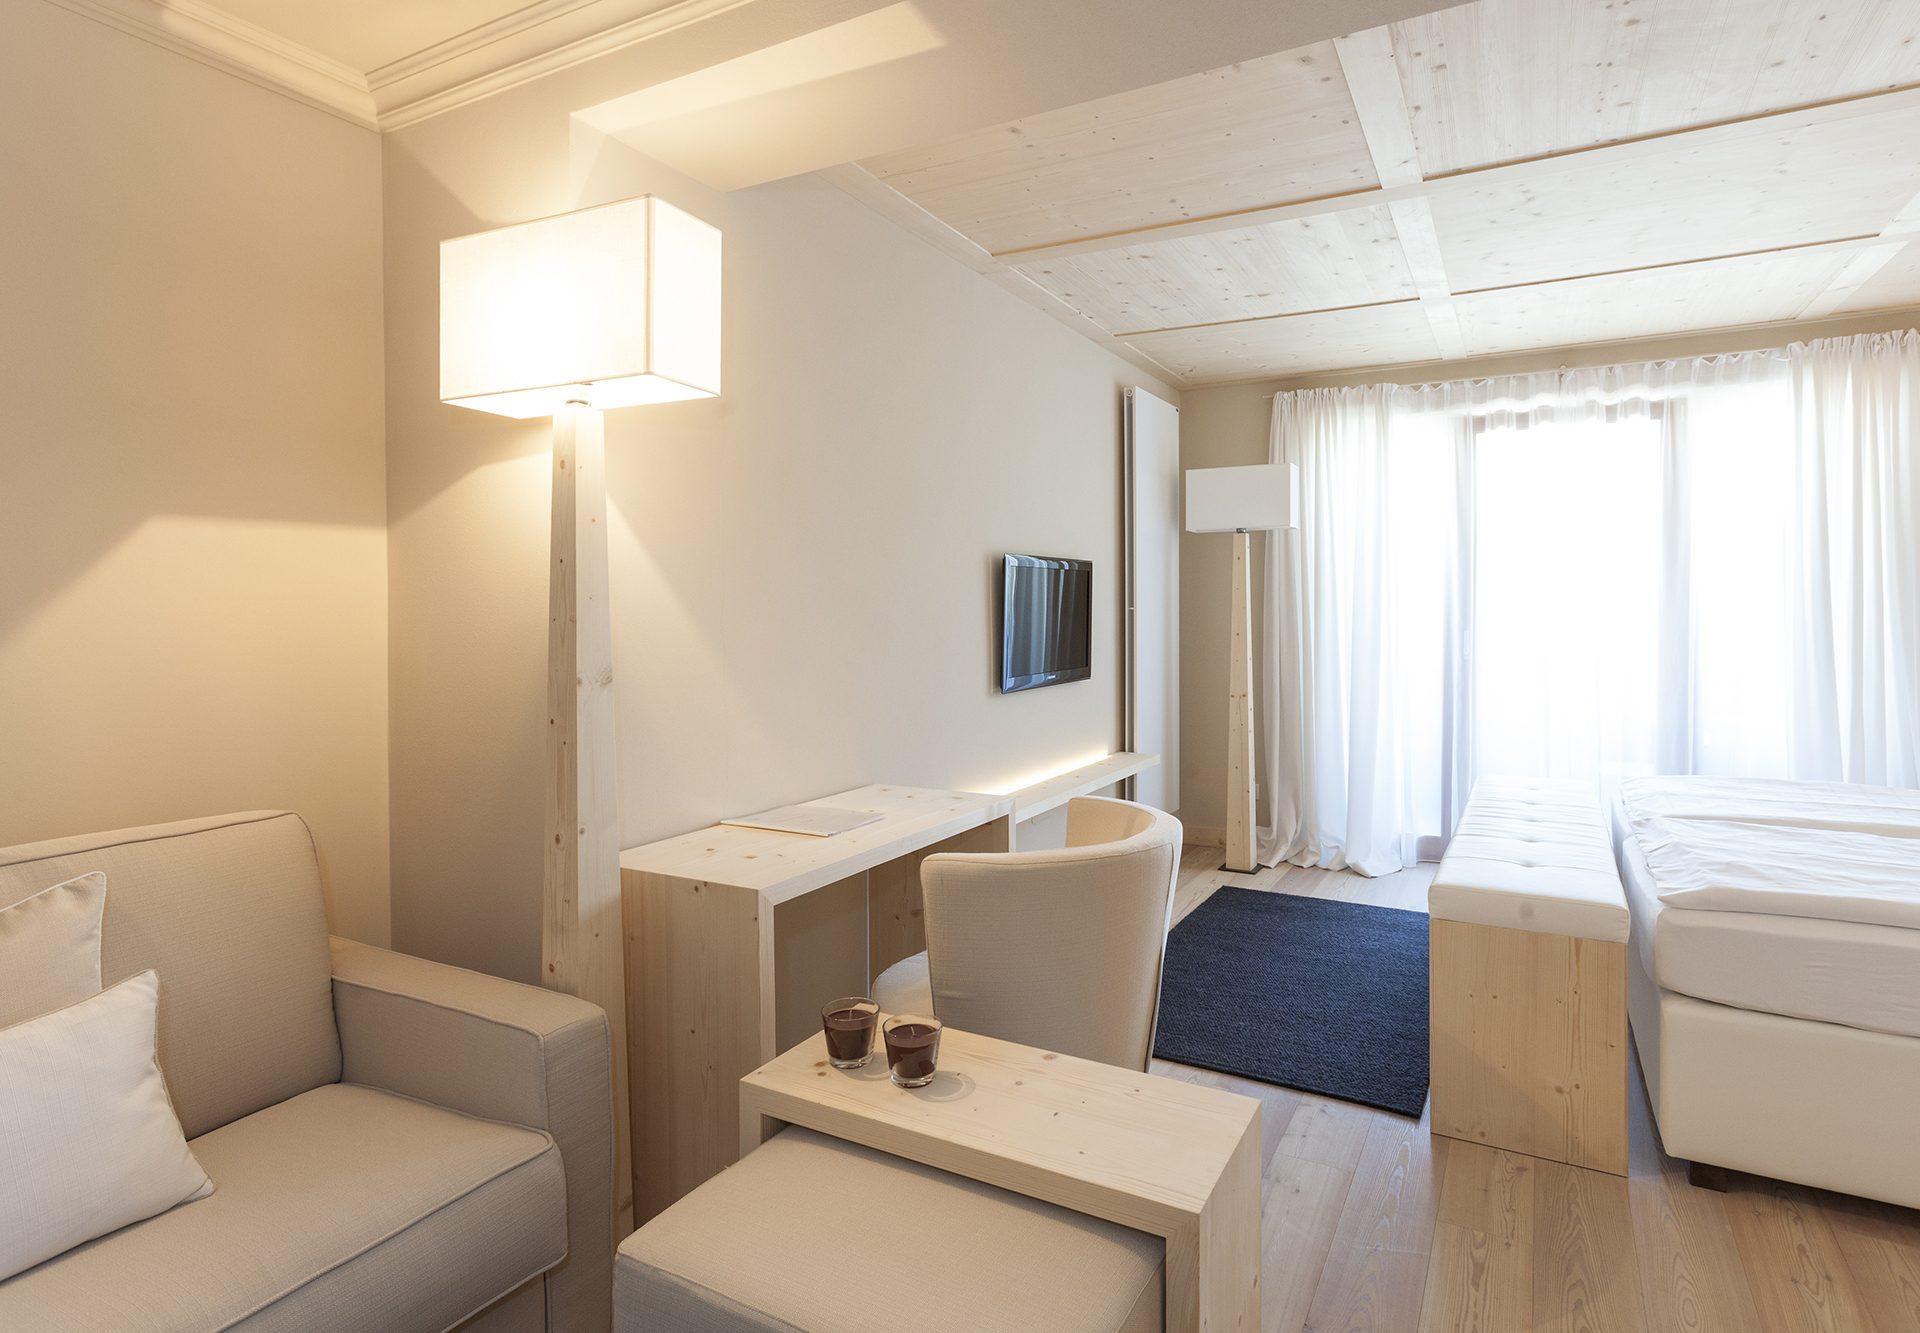 mayr-comfort room living area